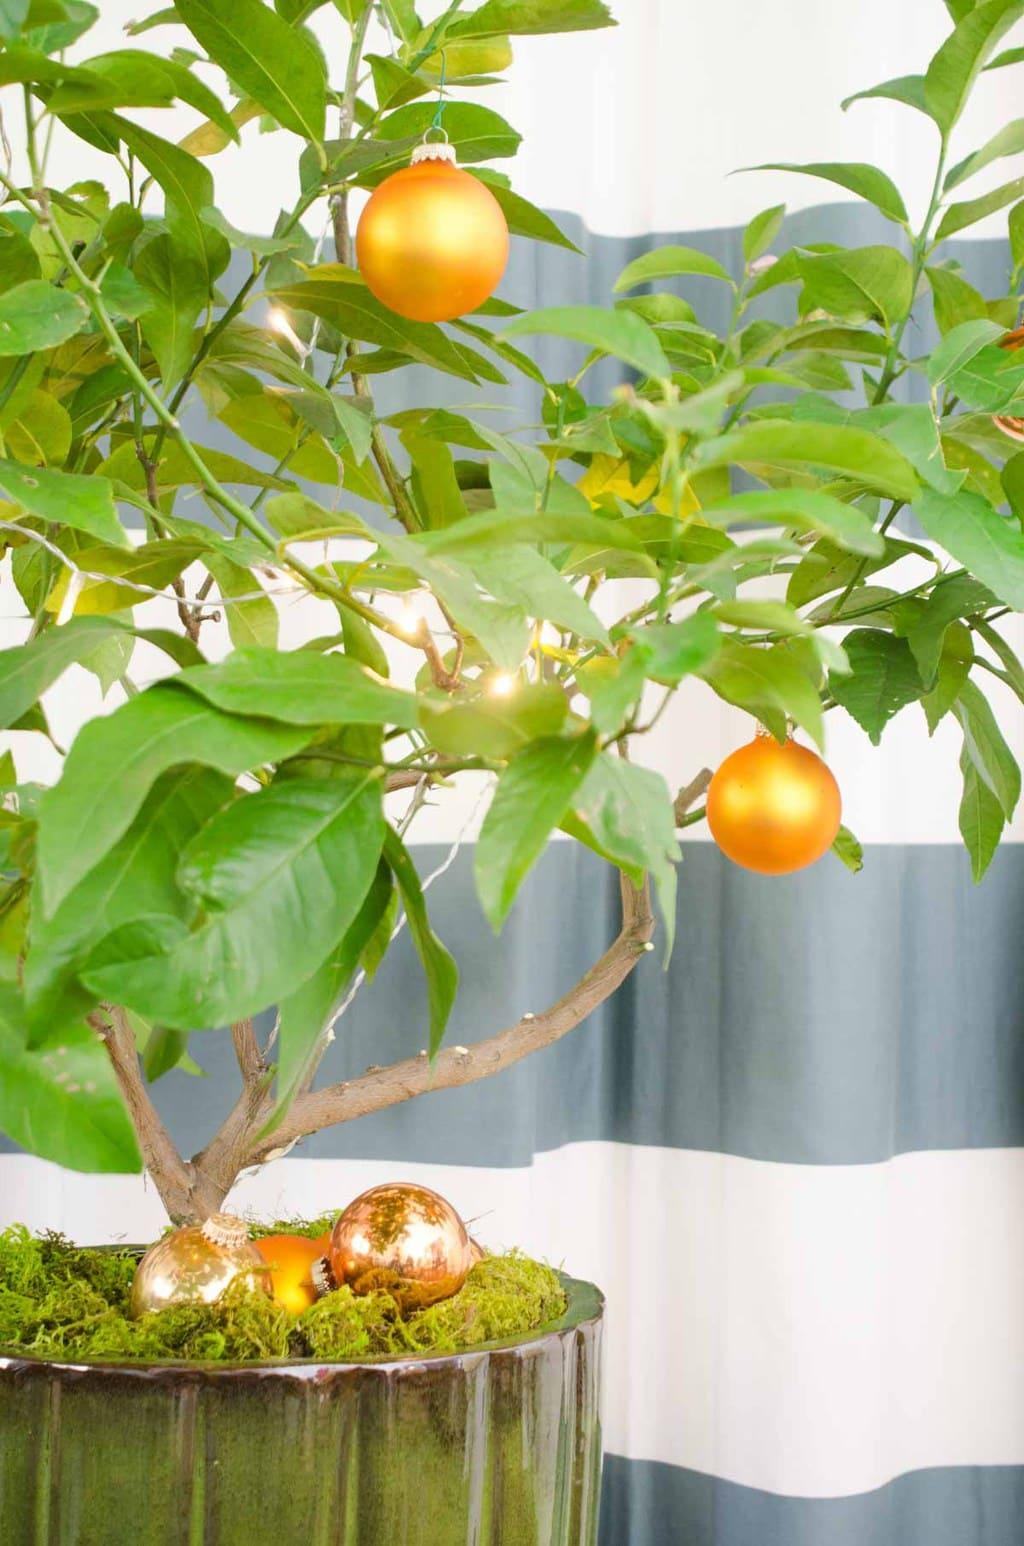 Citrus Christmas tree, holiday decor ideas on @thouswellblog